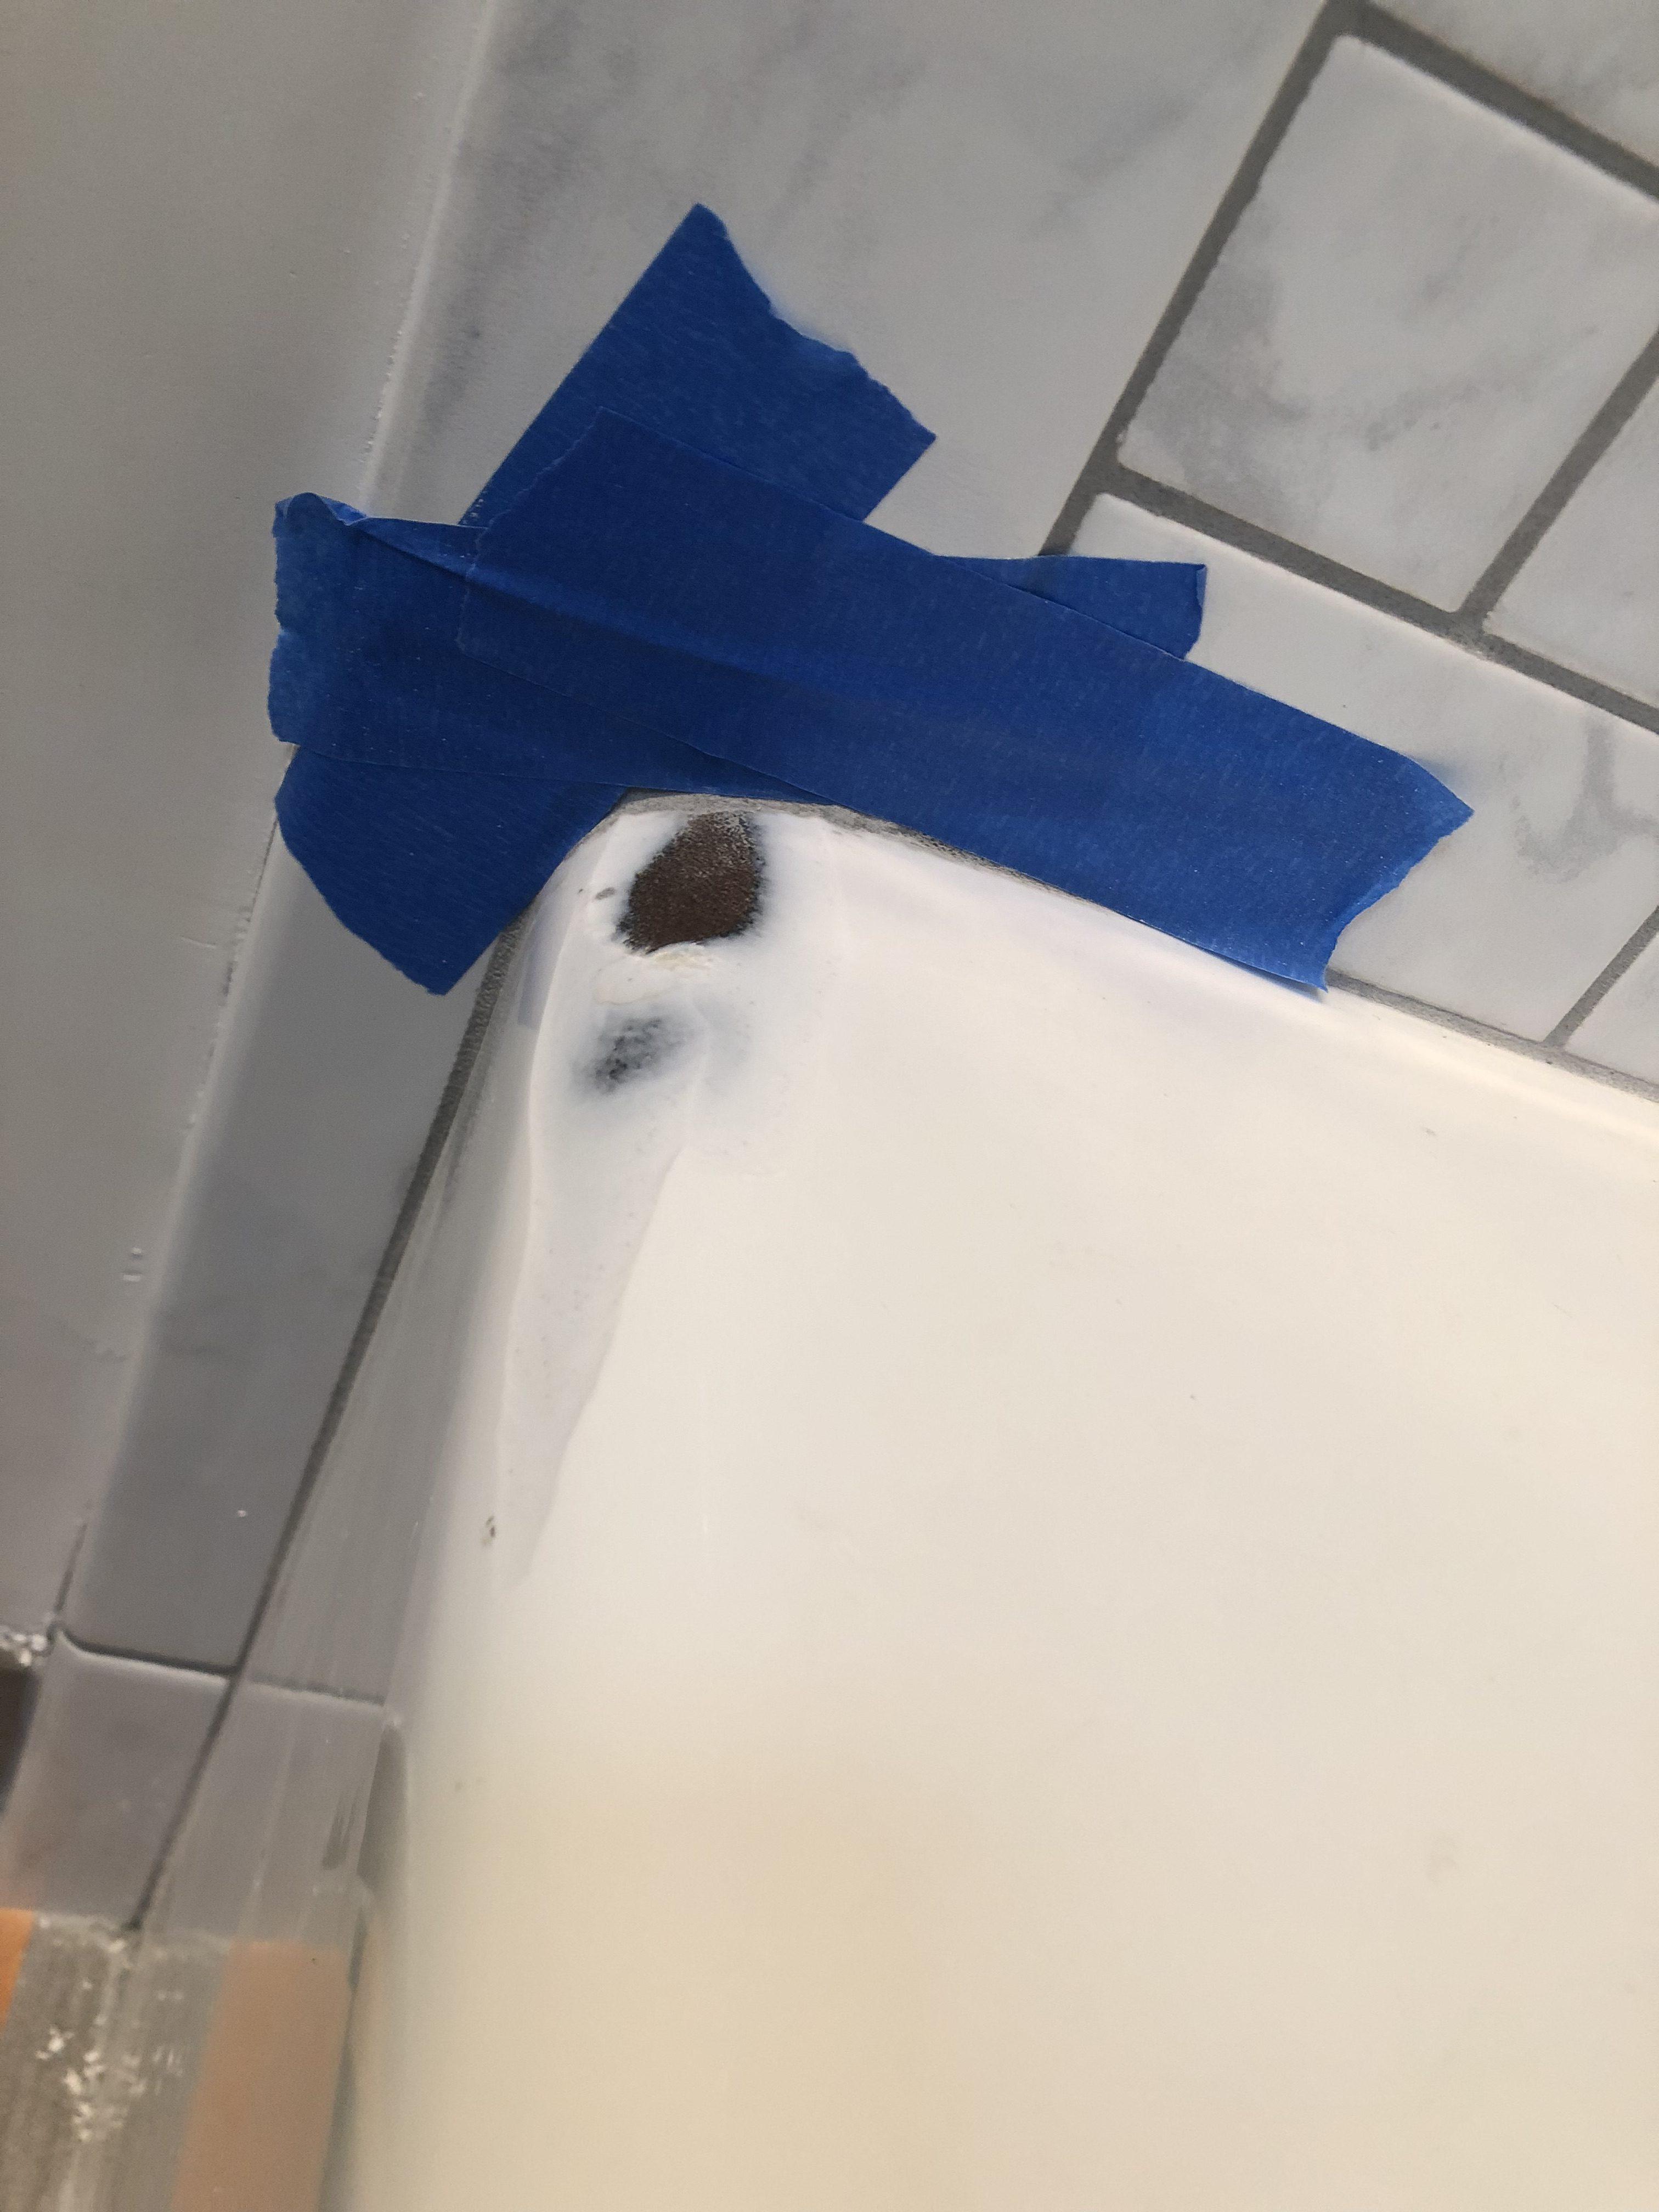 Bathtub Refinishing Before Spot Repair Work - NuFinishPro